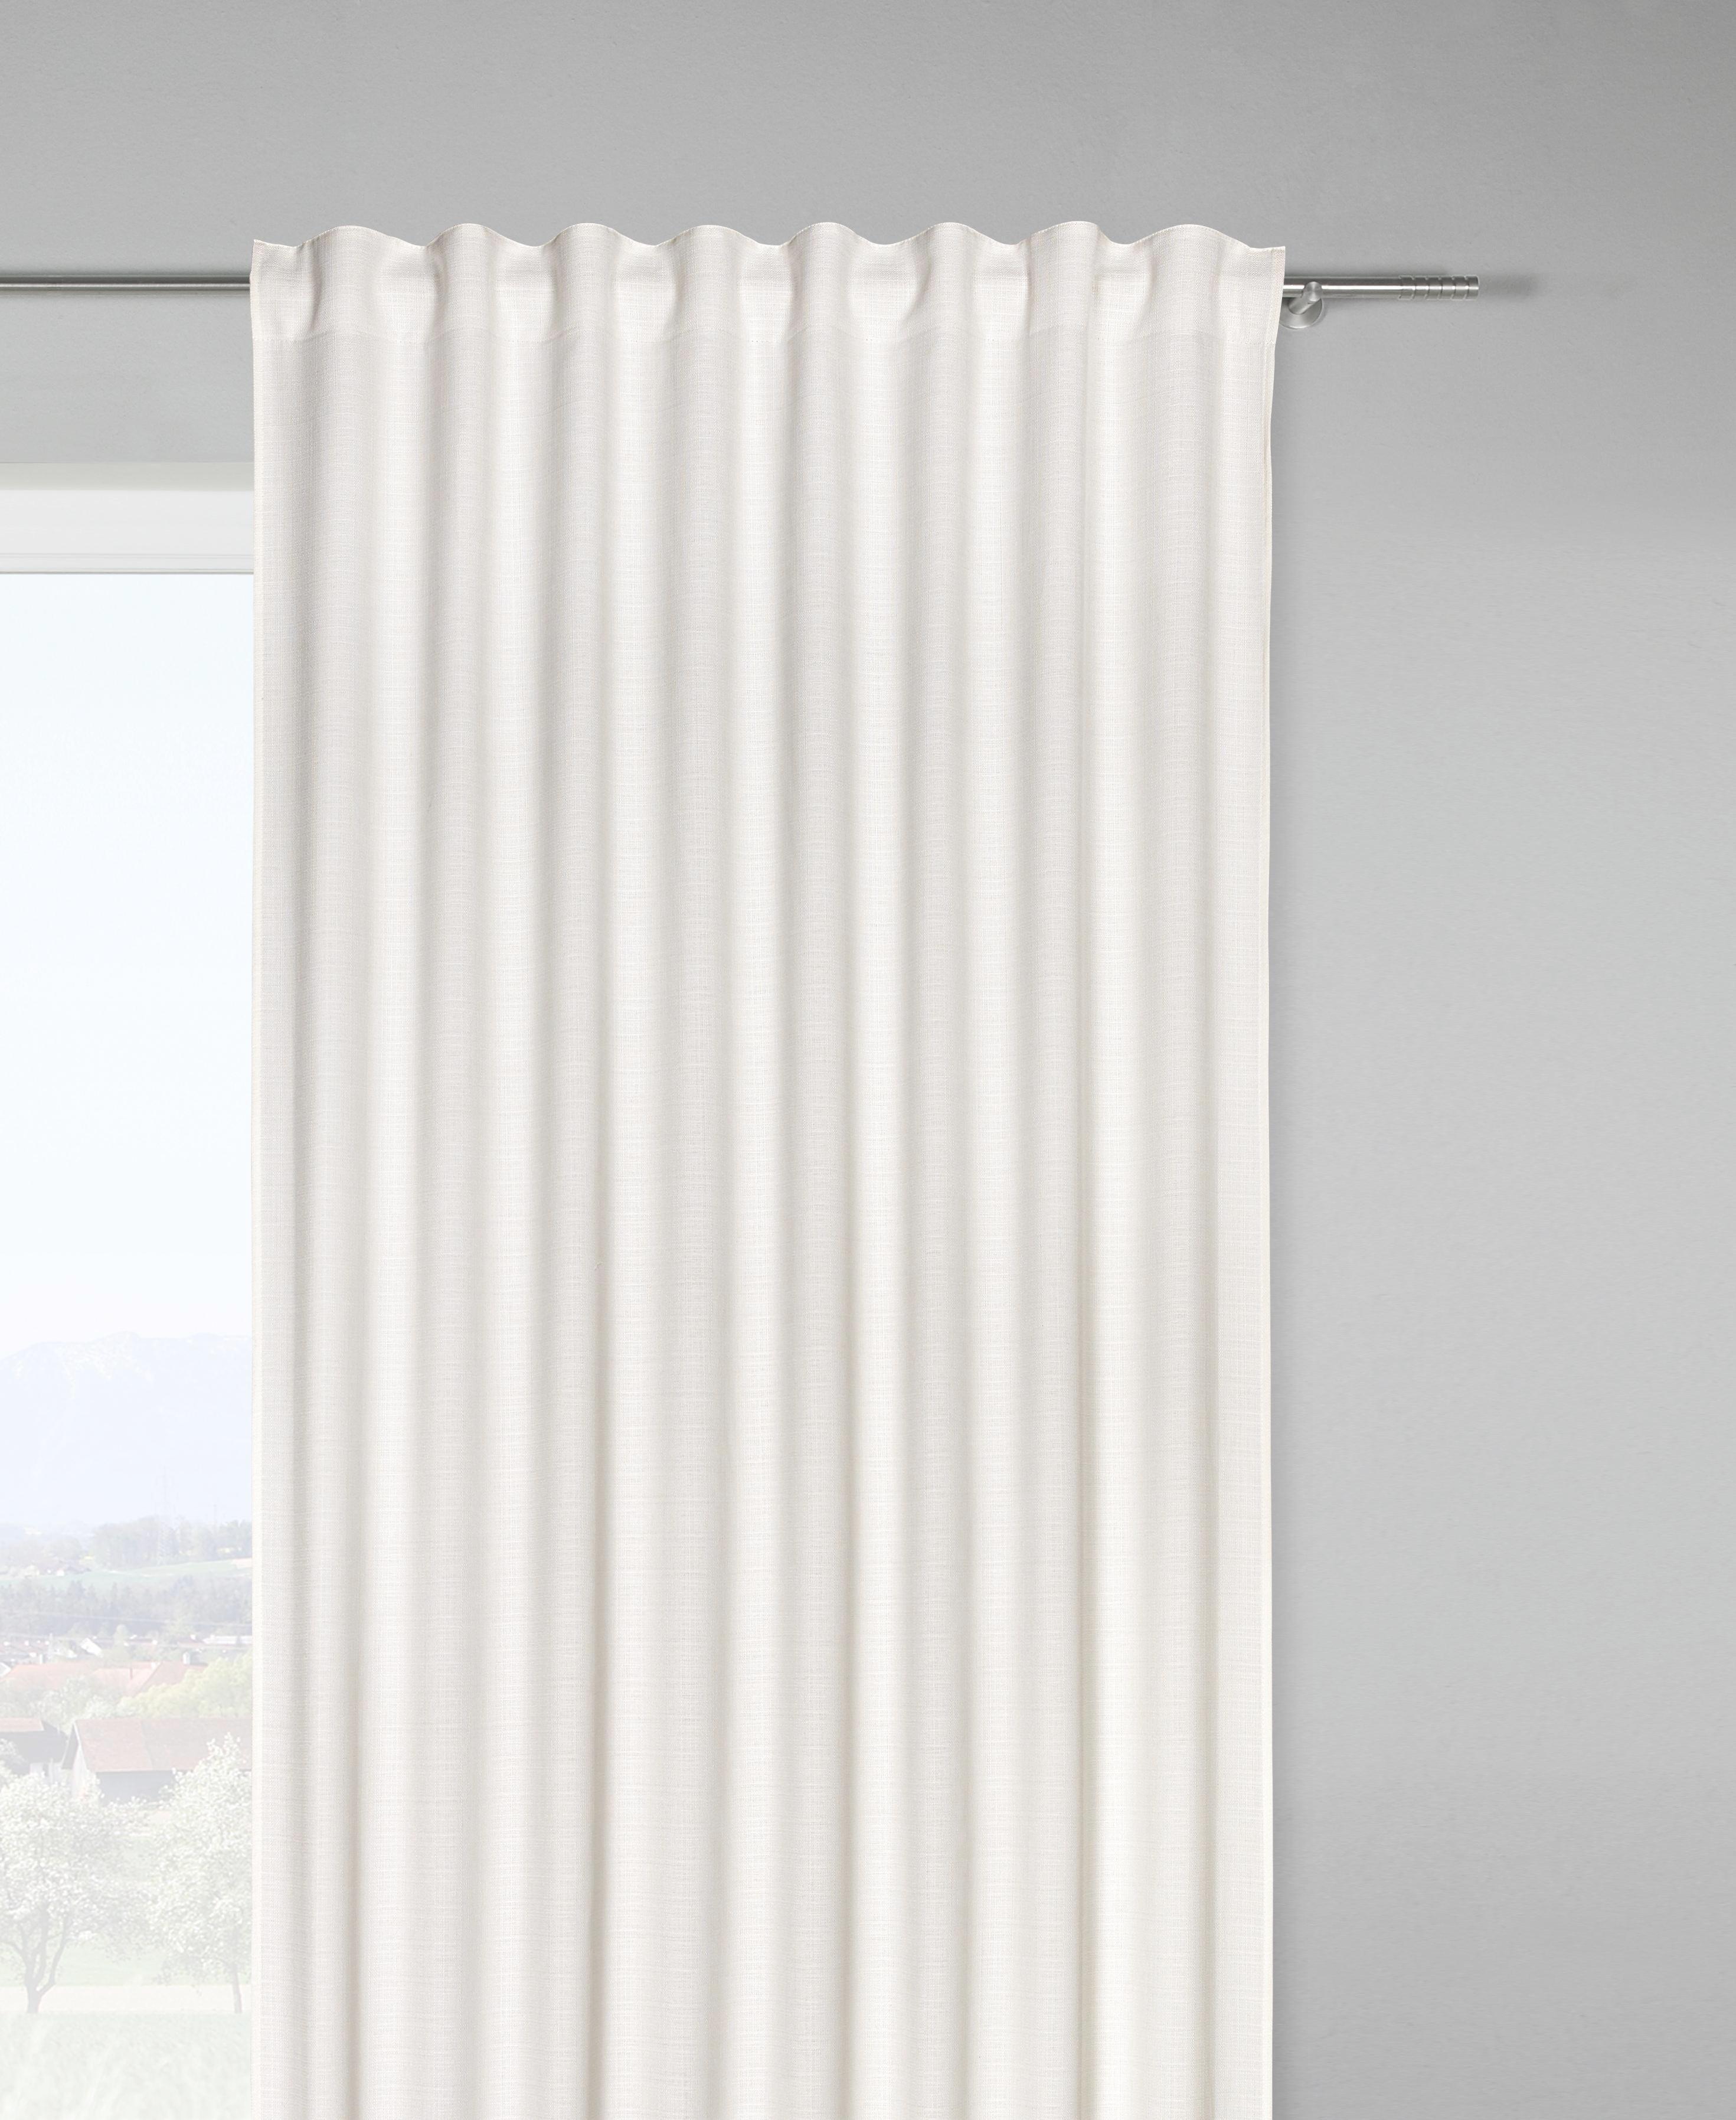 Fertigvorhang Leo in Weiß, ca. 140x255cm - Naturfarben, Textil (135/255cm) - PREMIUM LIVING